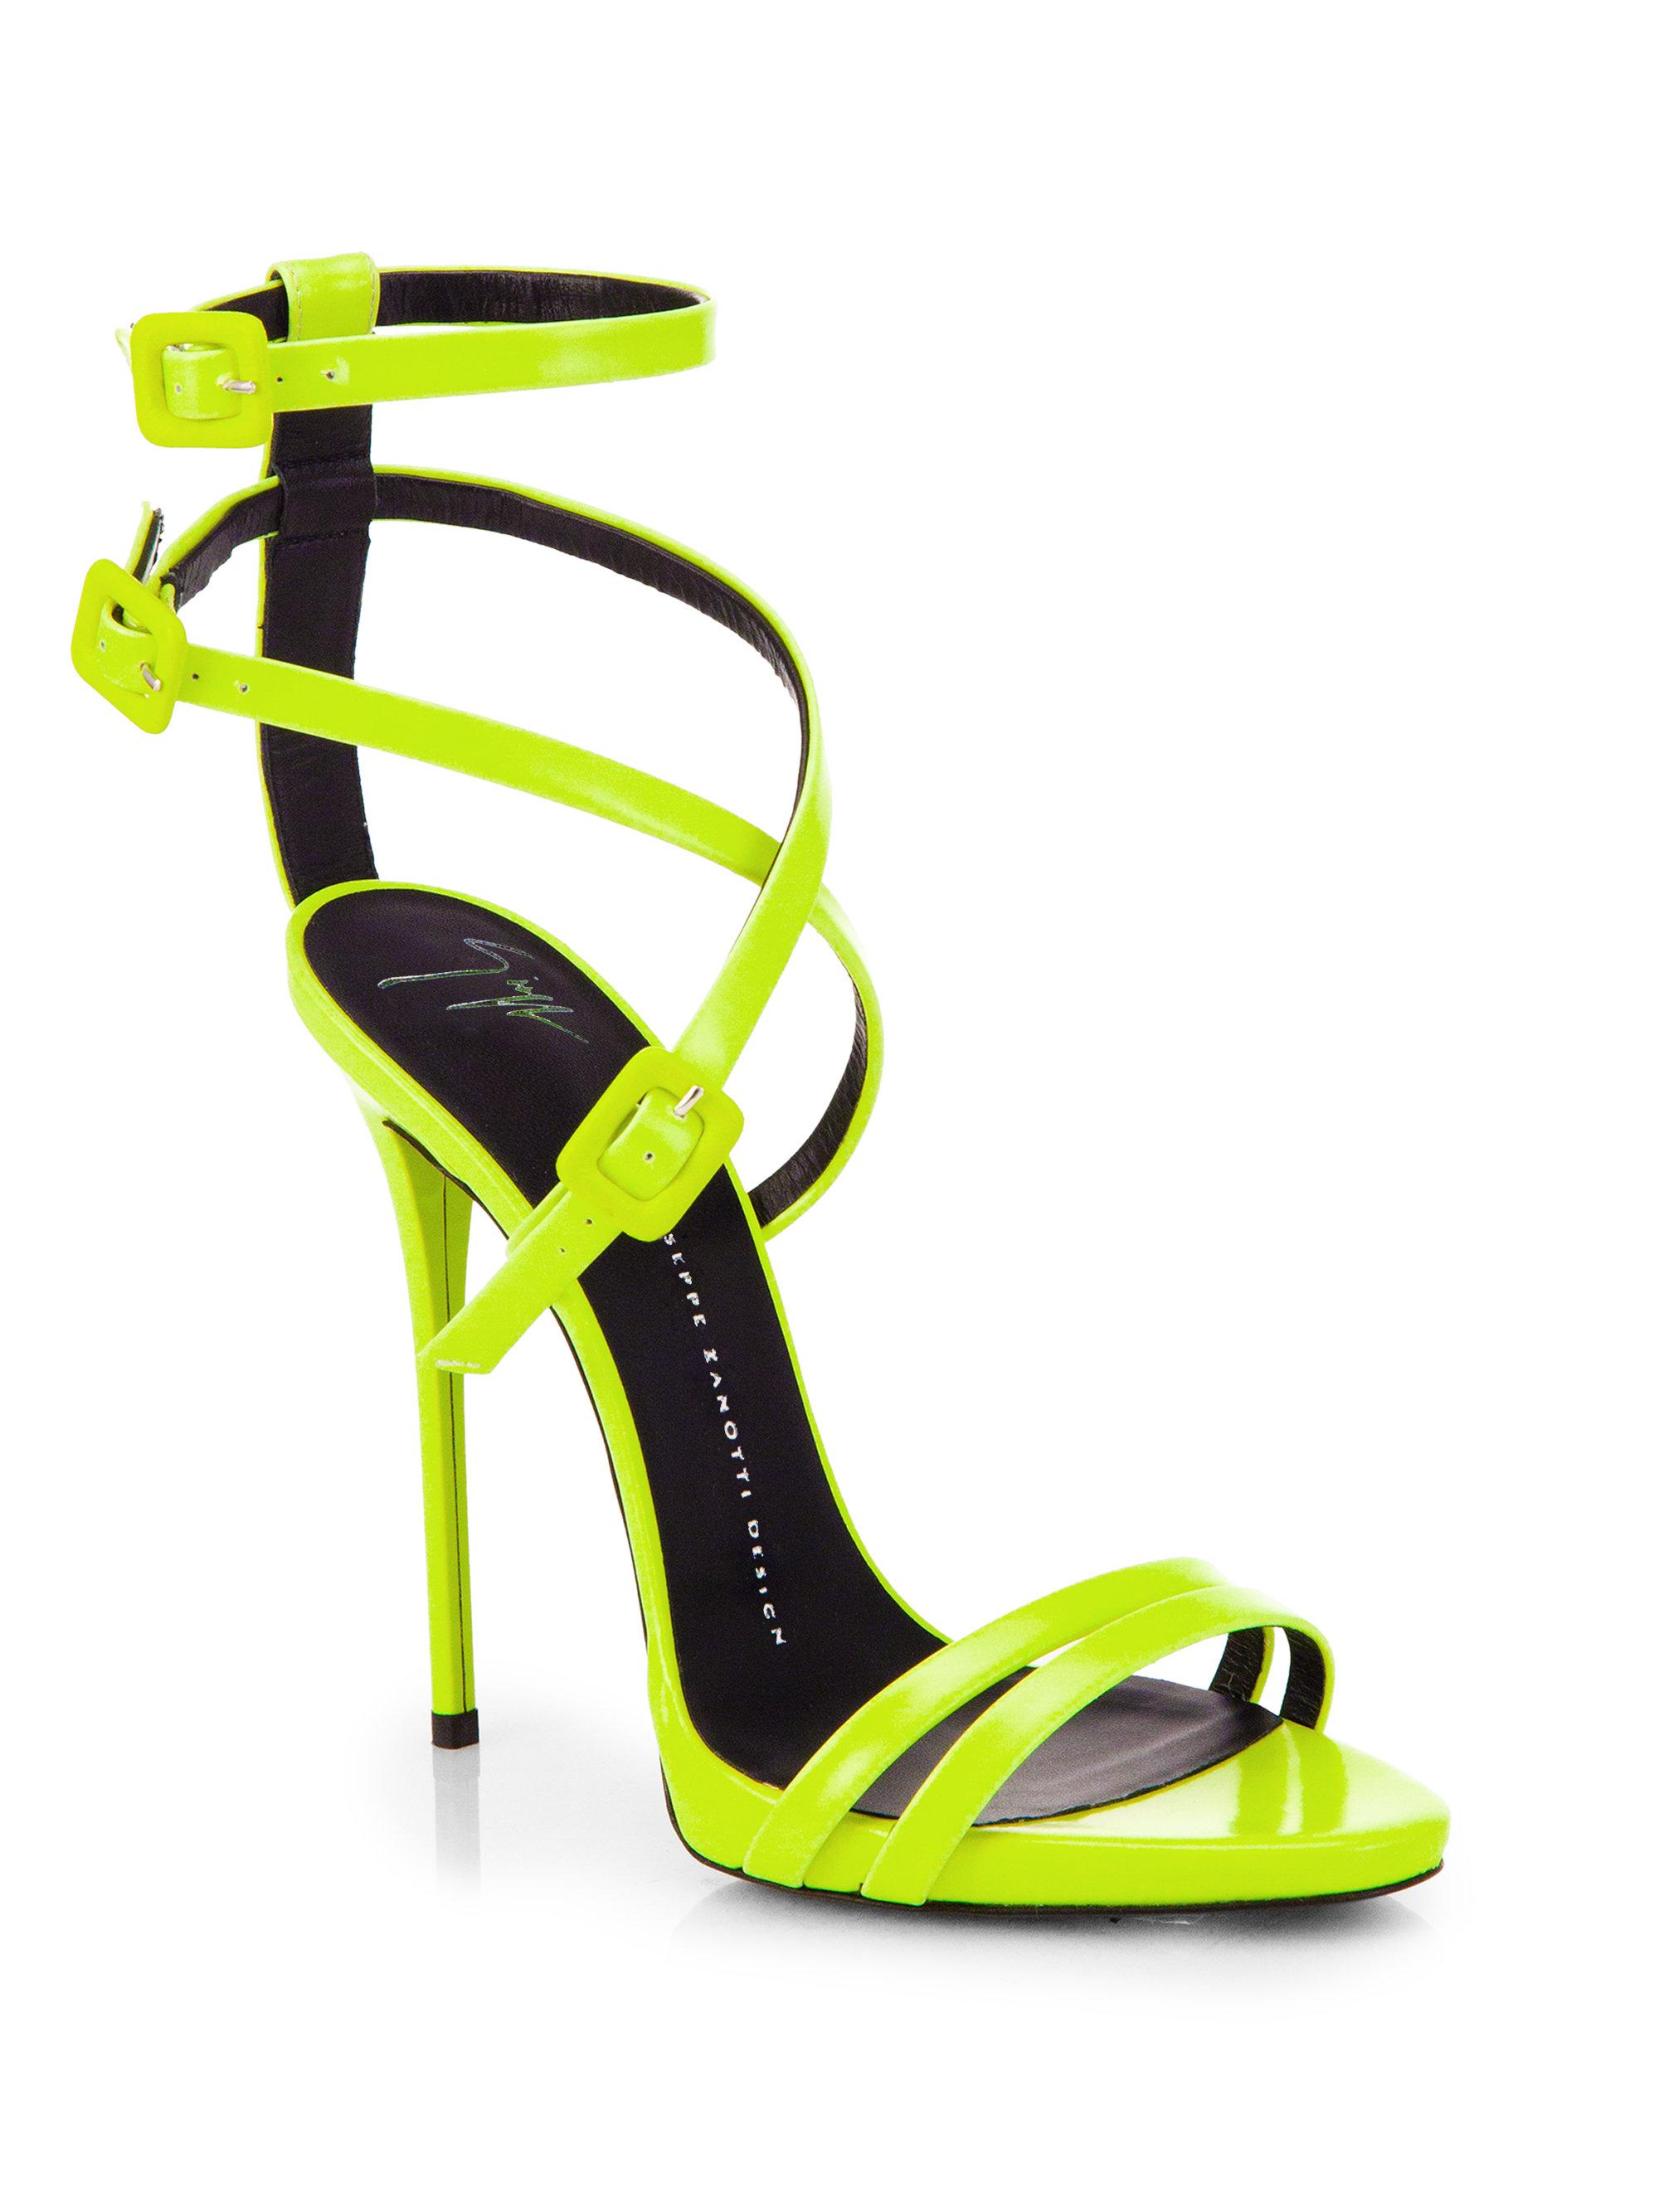 ba2e4a8b231 ... get lyst giuseppe zanotti leather skinny strap sandals in green 22cbd  4e2a7